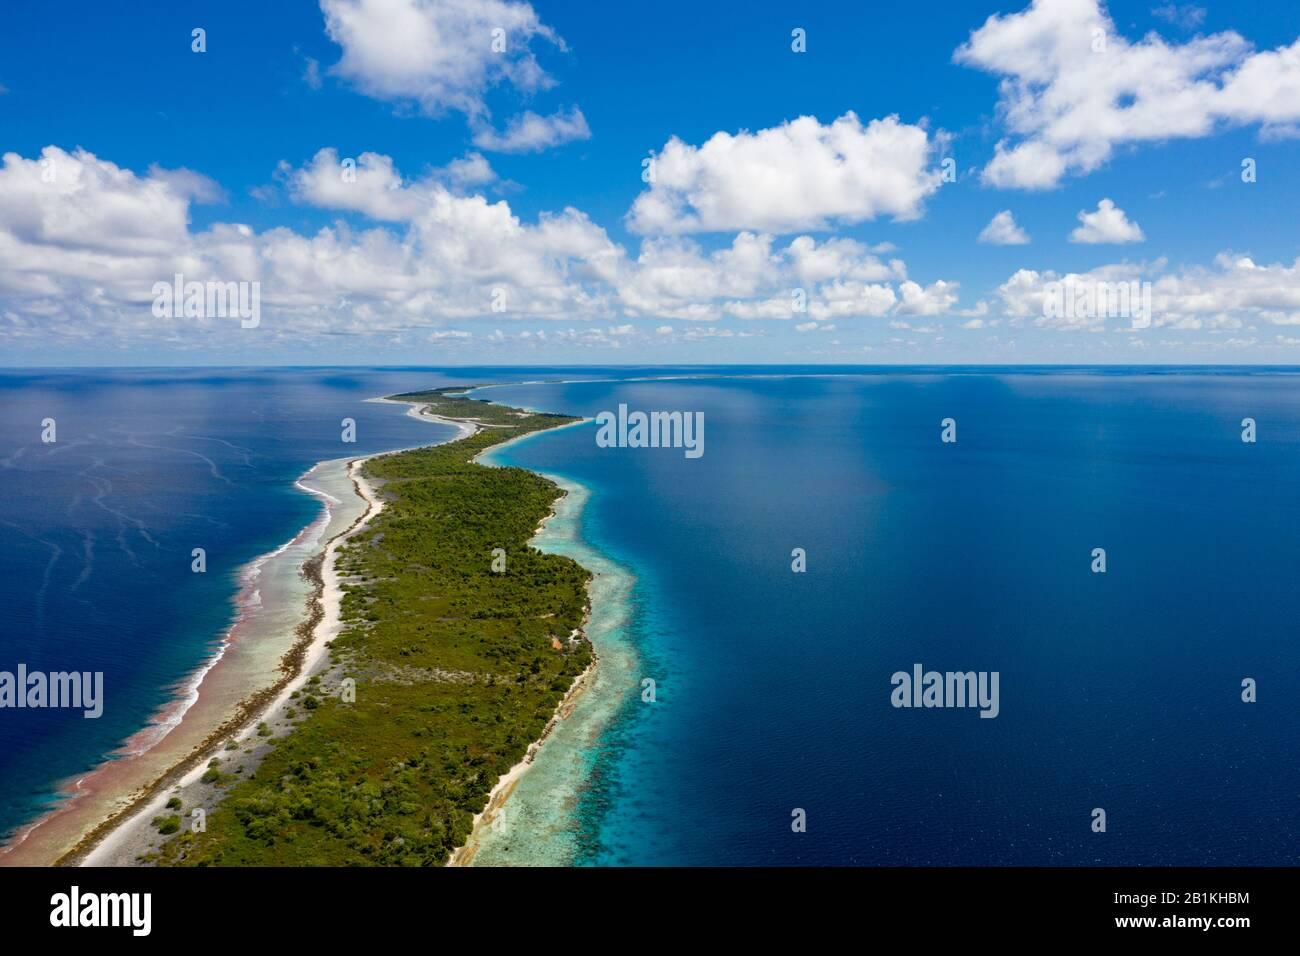 Impresiones Del Atolón Kauehi, Tuamotu Archipel, Polinesia Francesa Foto de stock